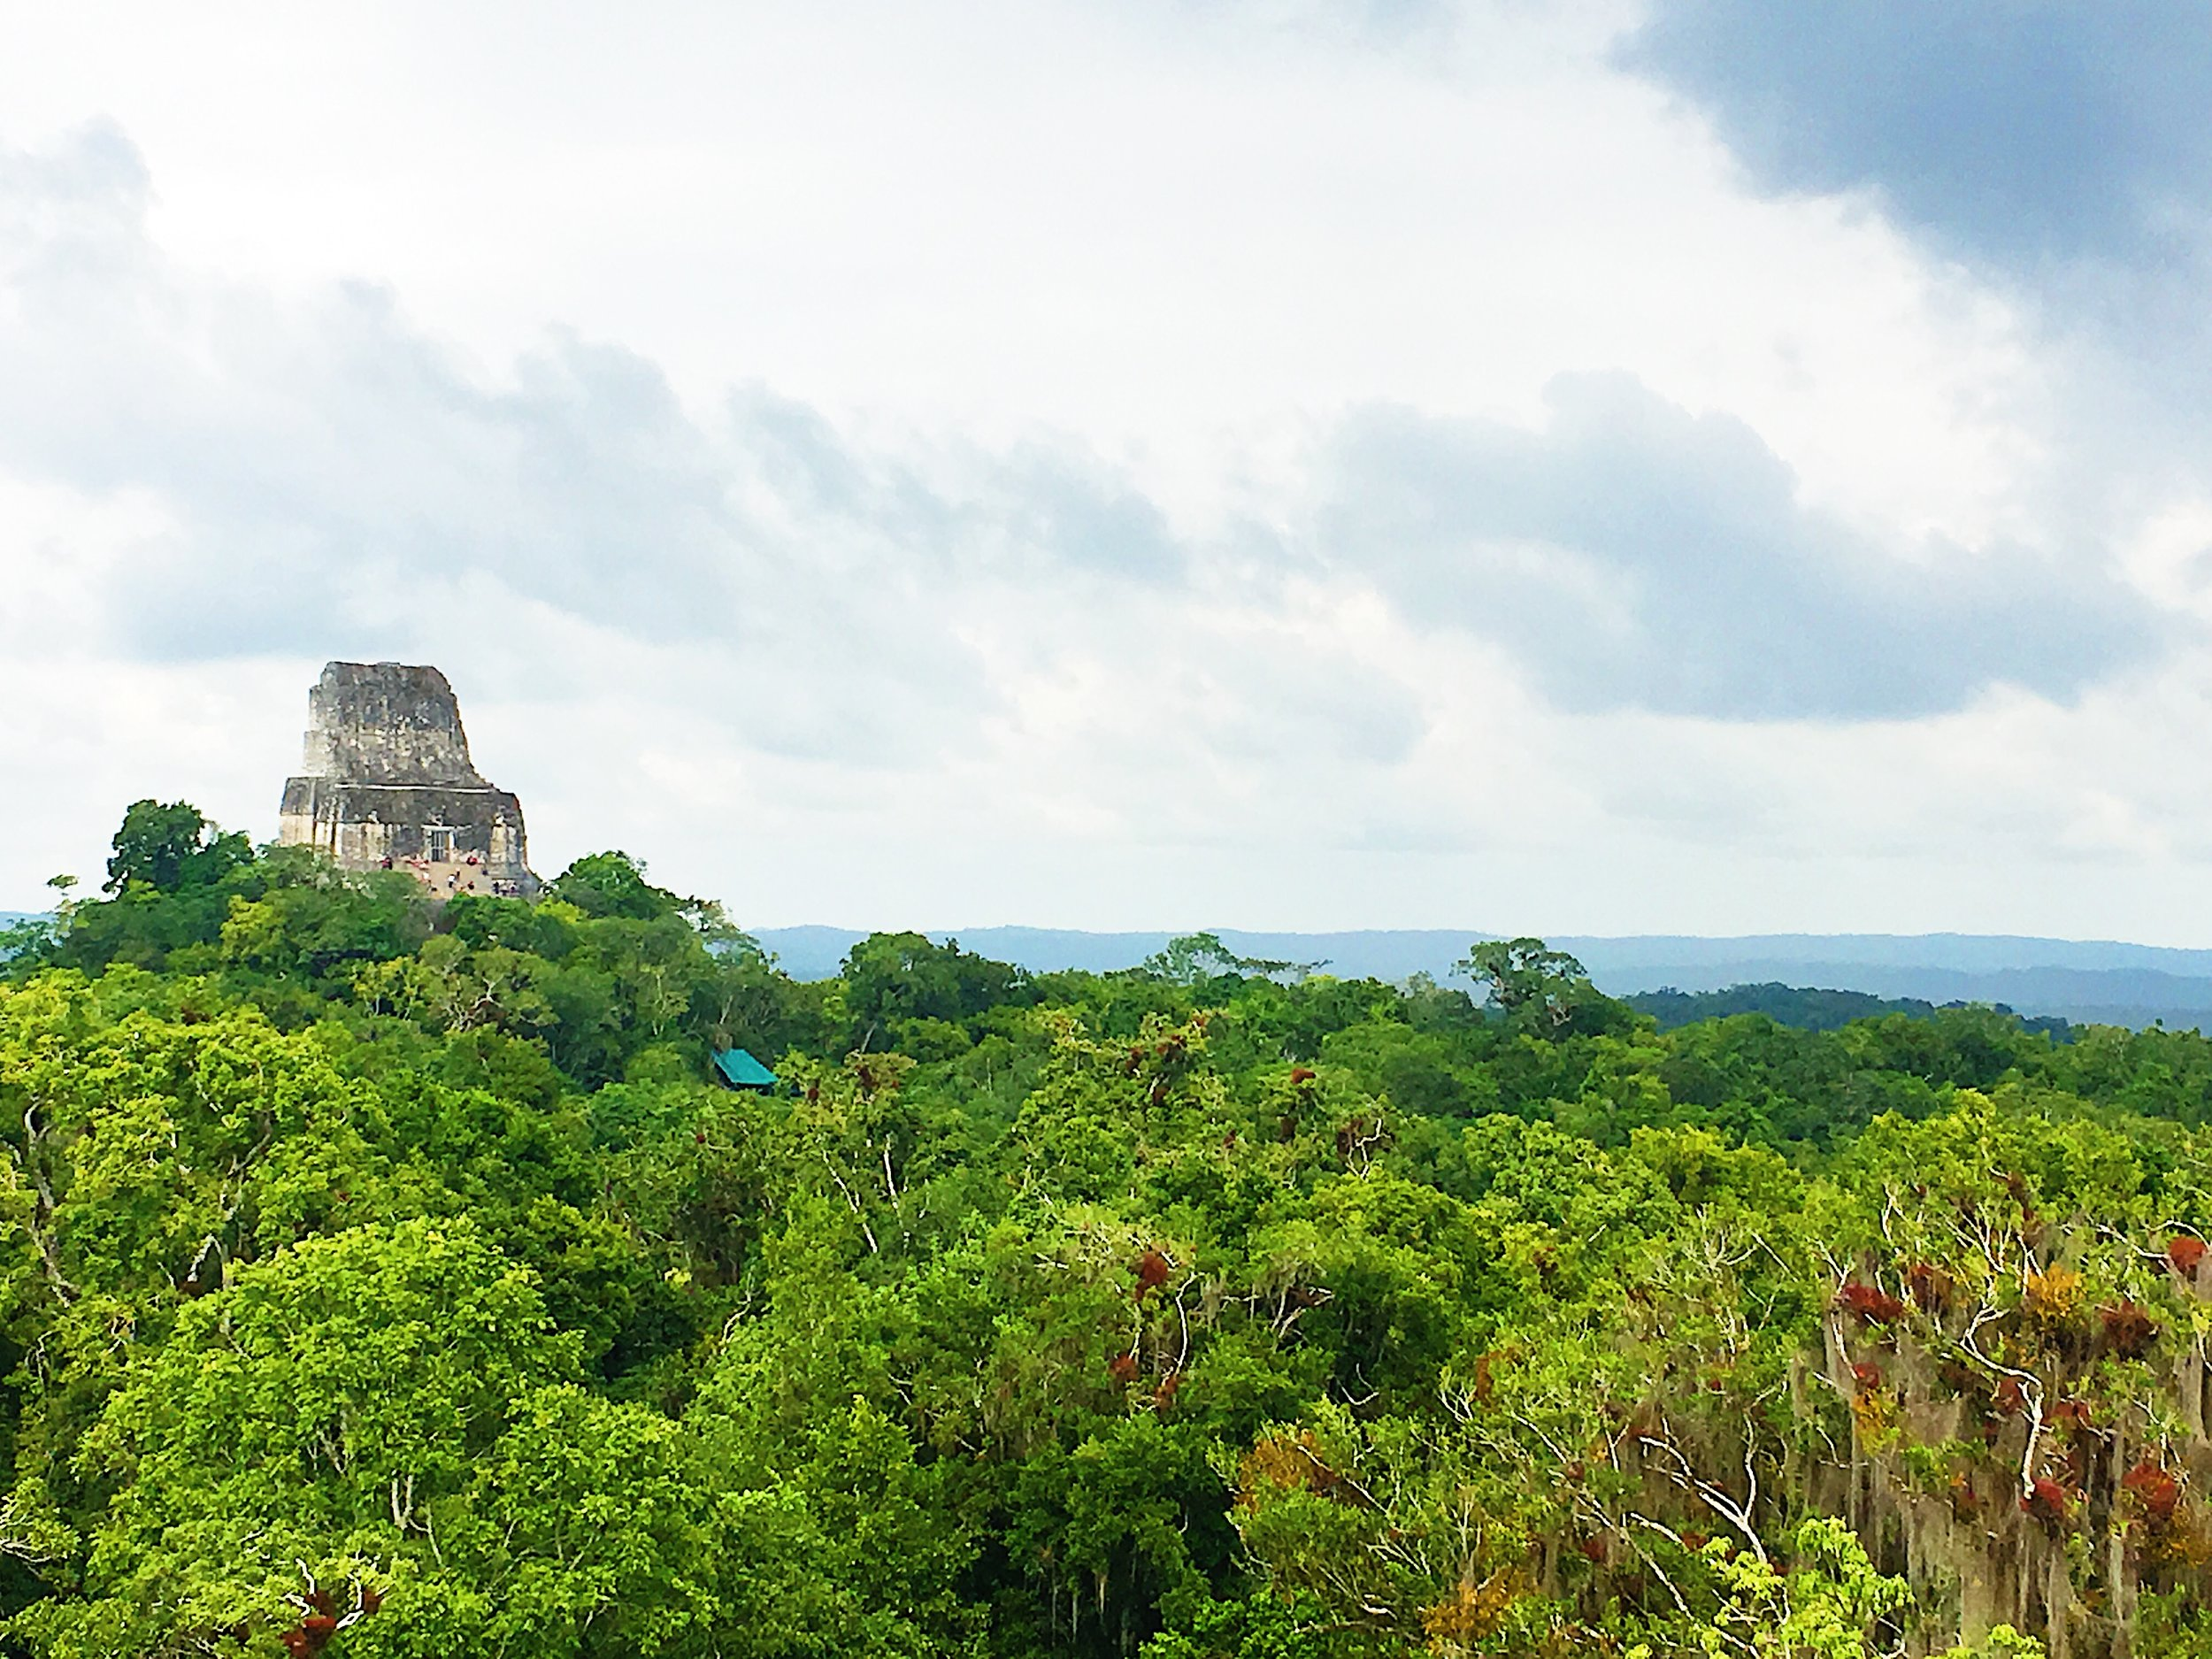 The view of Temple IV from El Mundo Perdido.